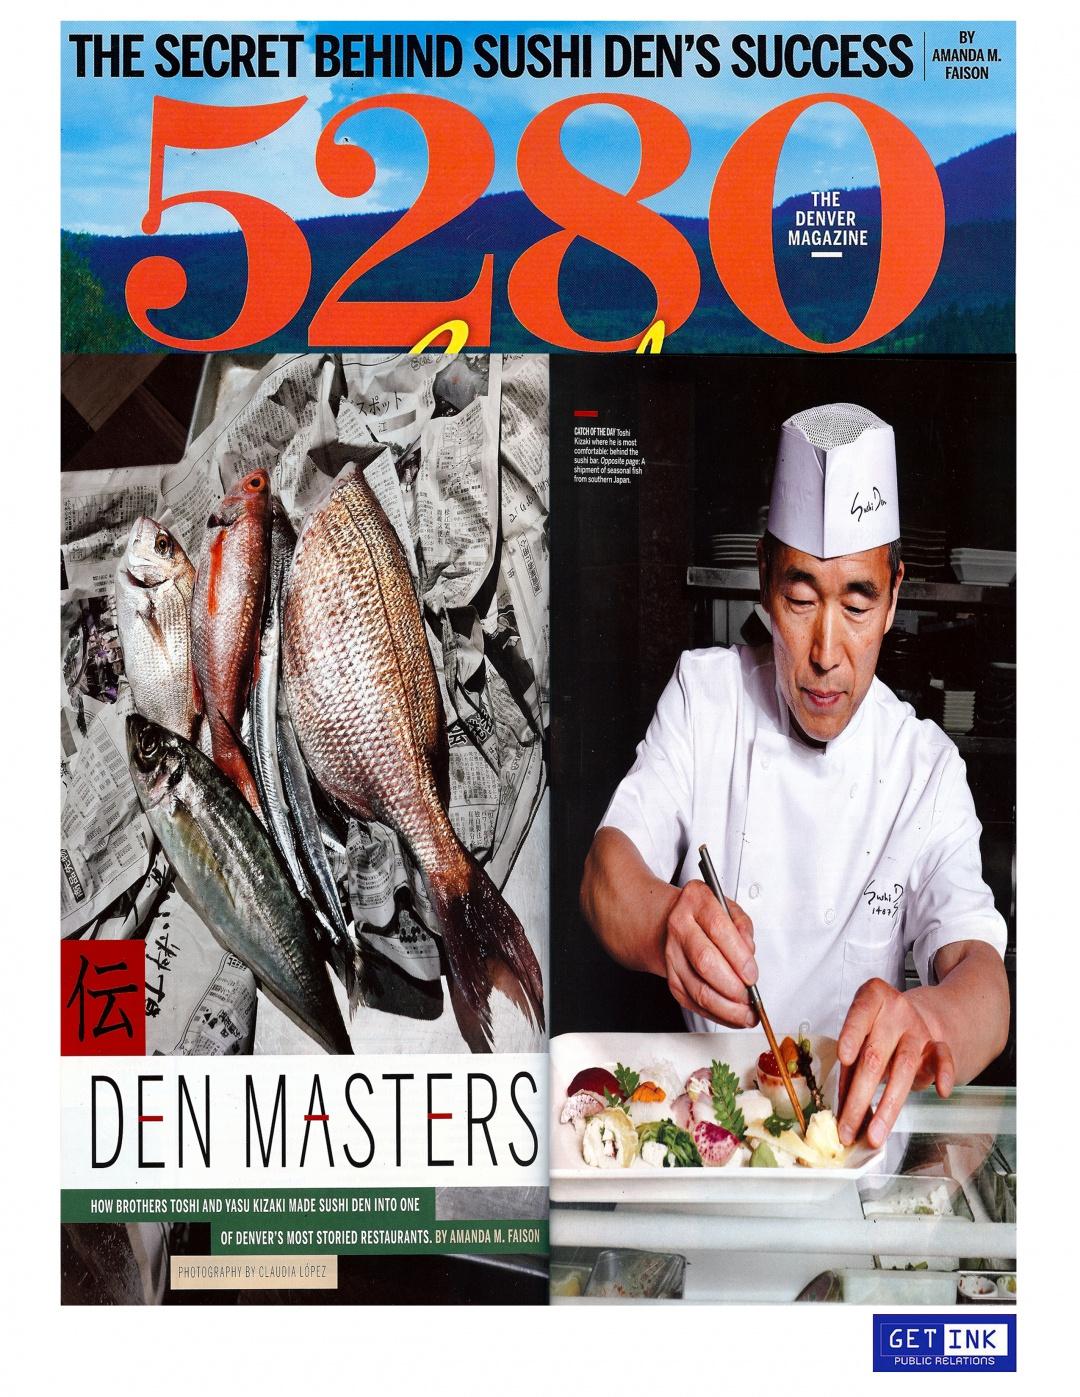 5280-Magazine-1-5.16.12